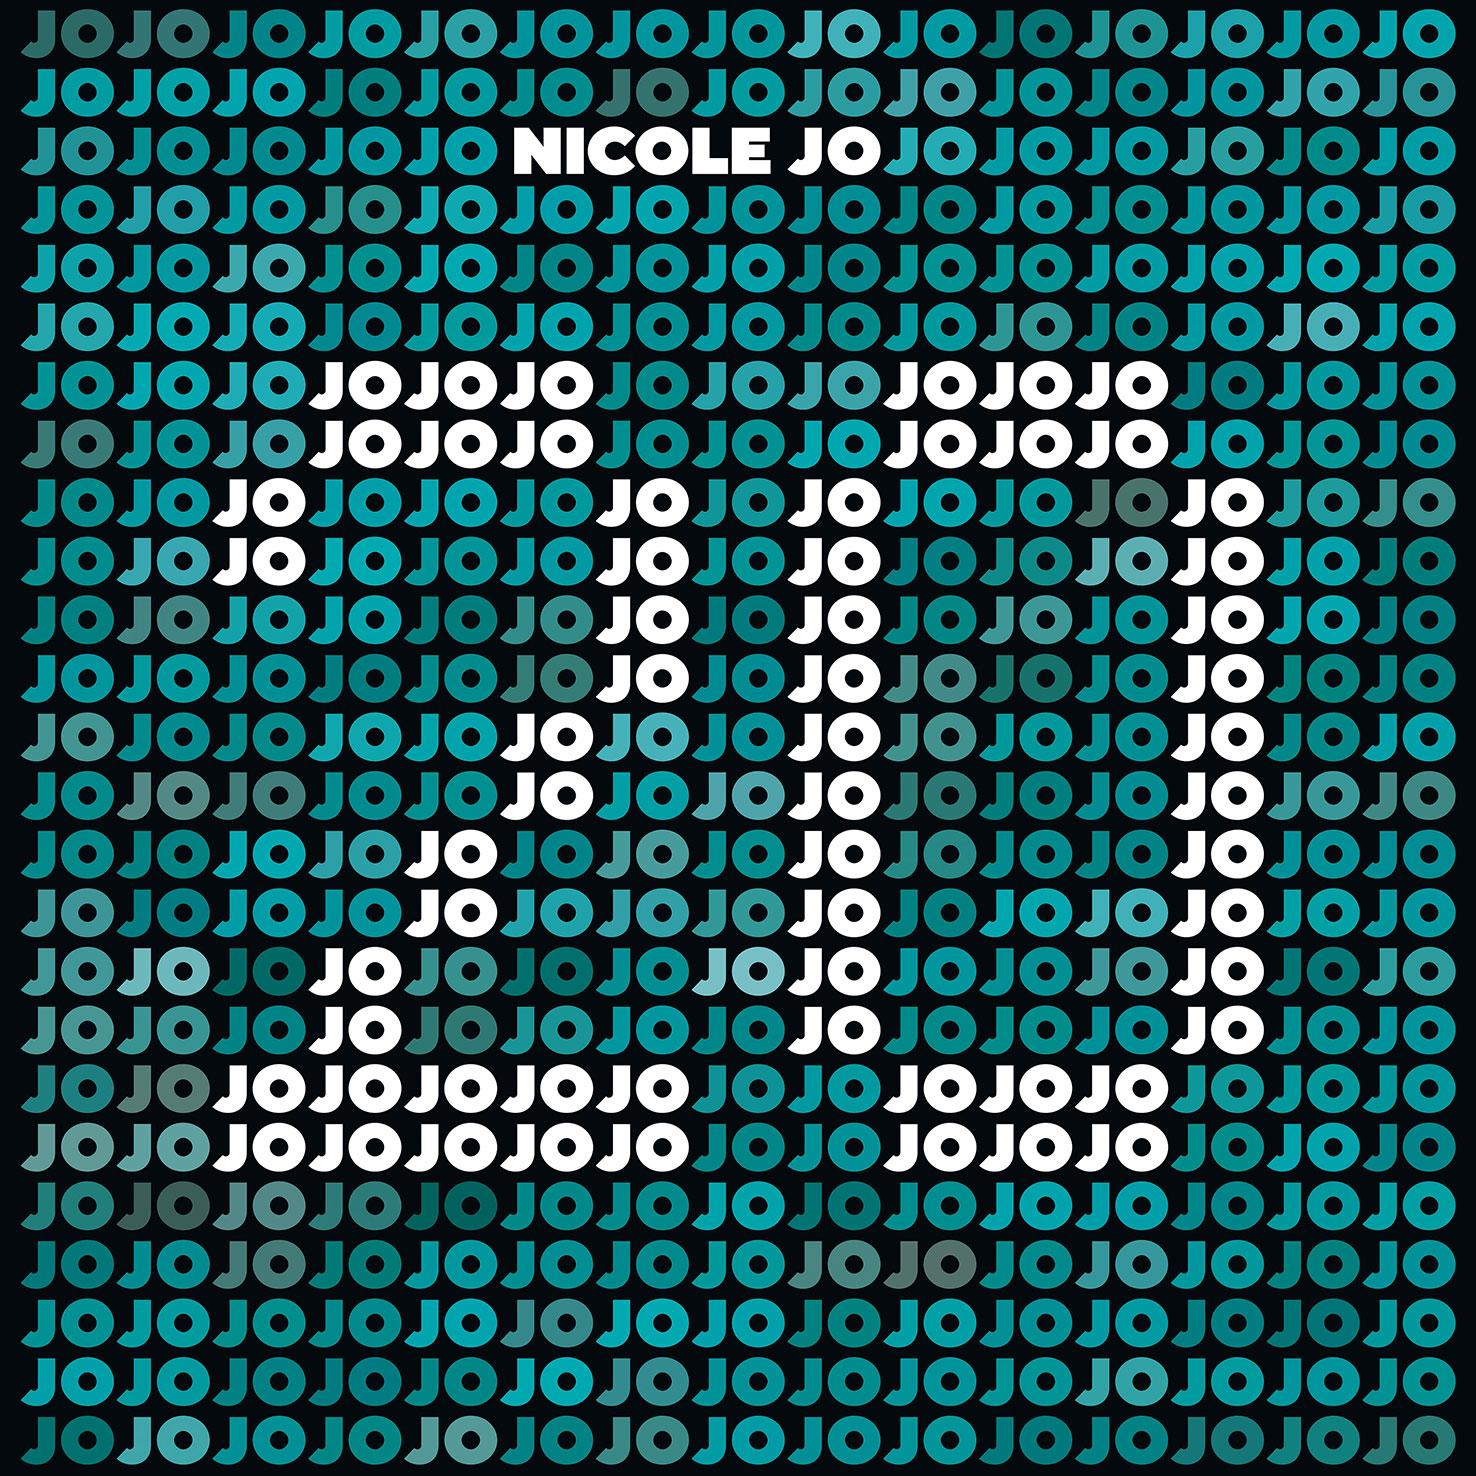 Nicole Jo –20